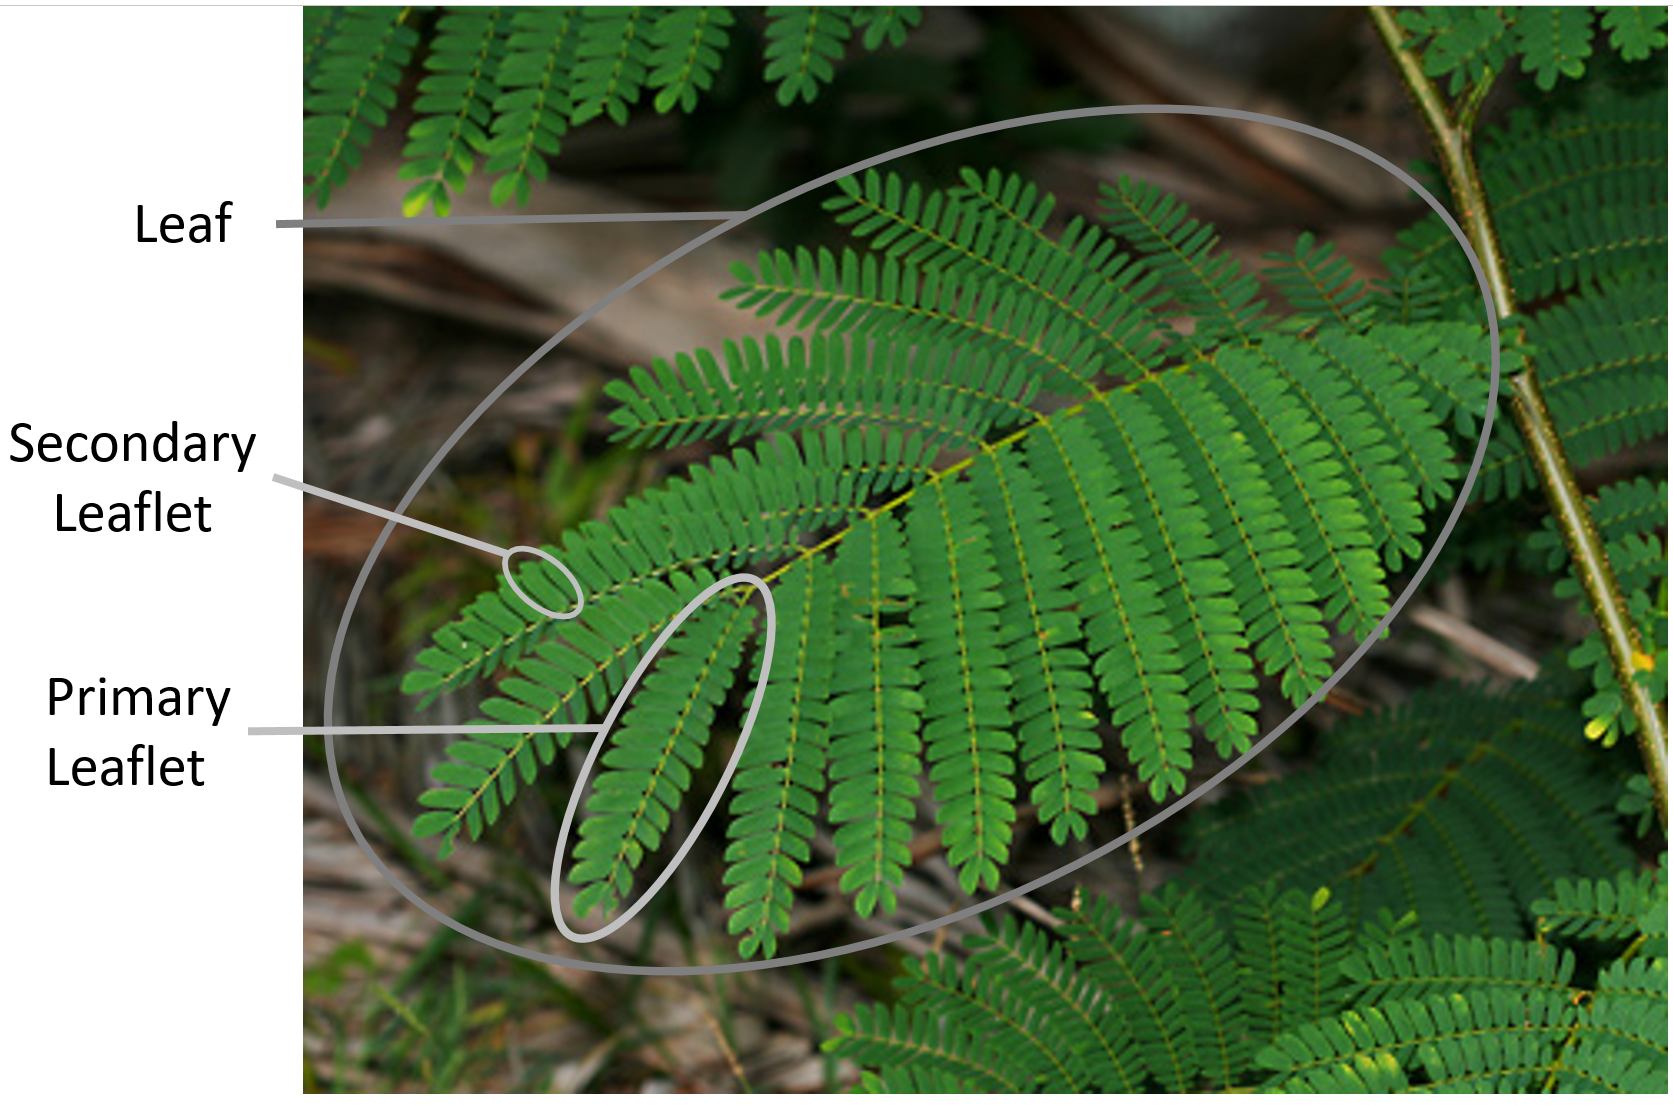 Falcataria moluccana - Albizia - Taxo4254 - Wiki nus